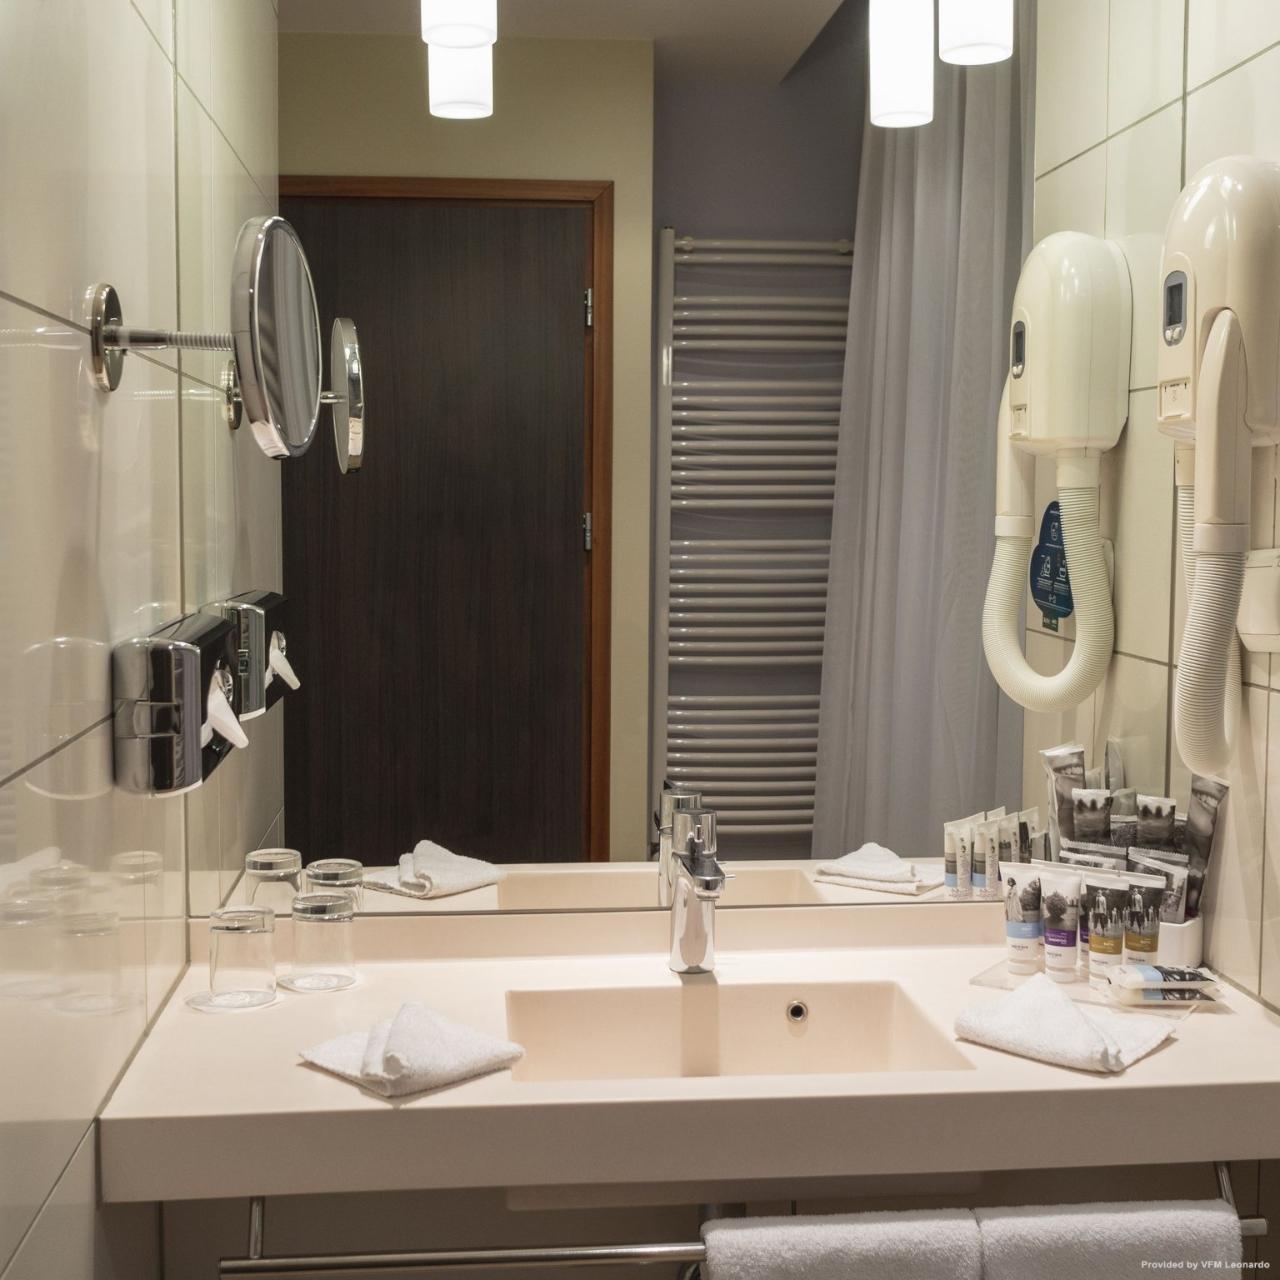 Hotel Mercure Warszawa Grand Warsaw Masovian Voivodeship At Hrs With Free Services